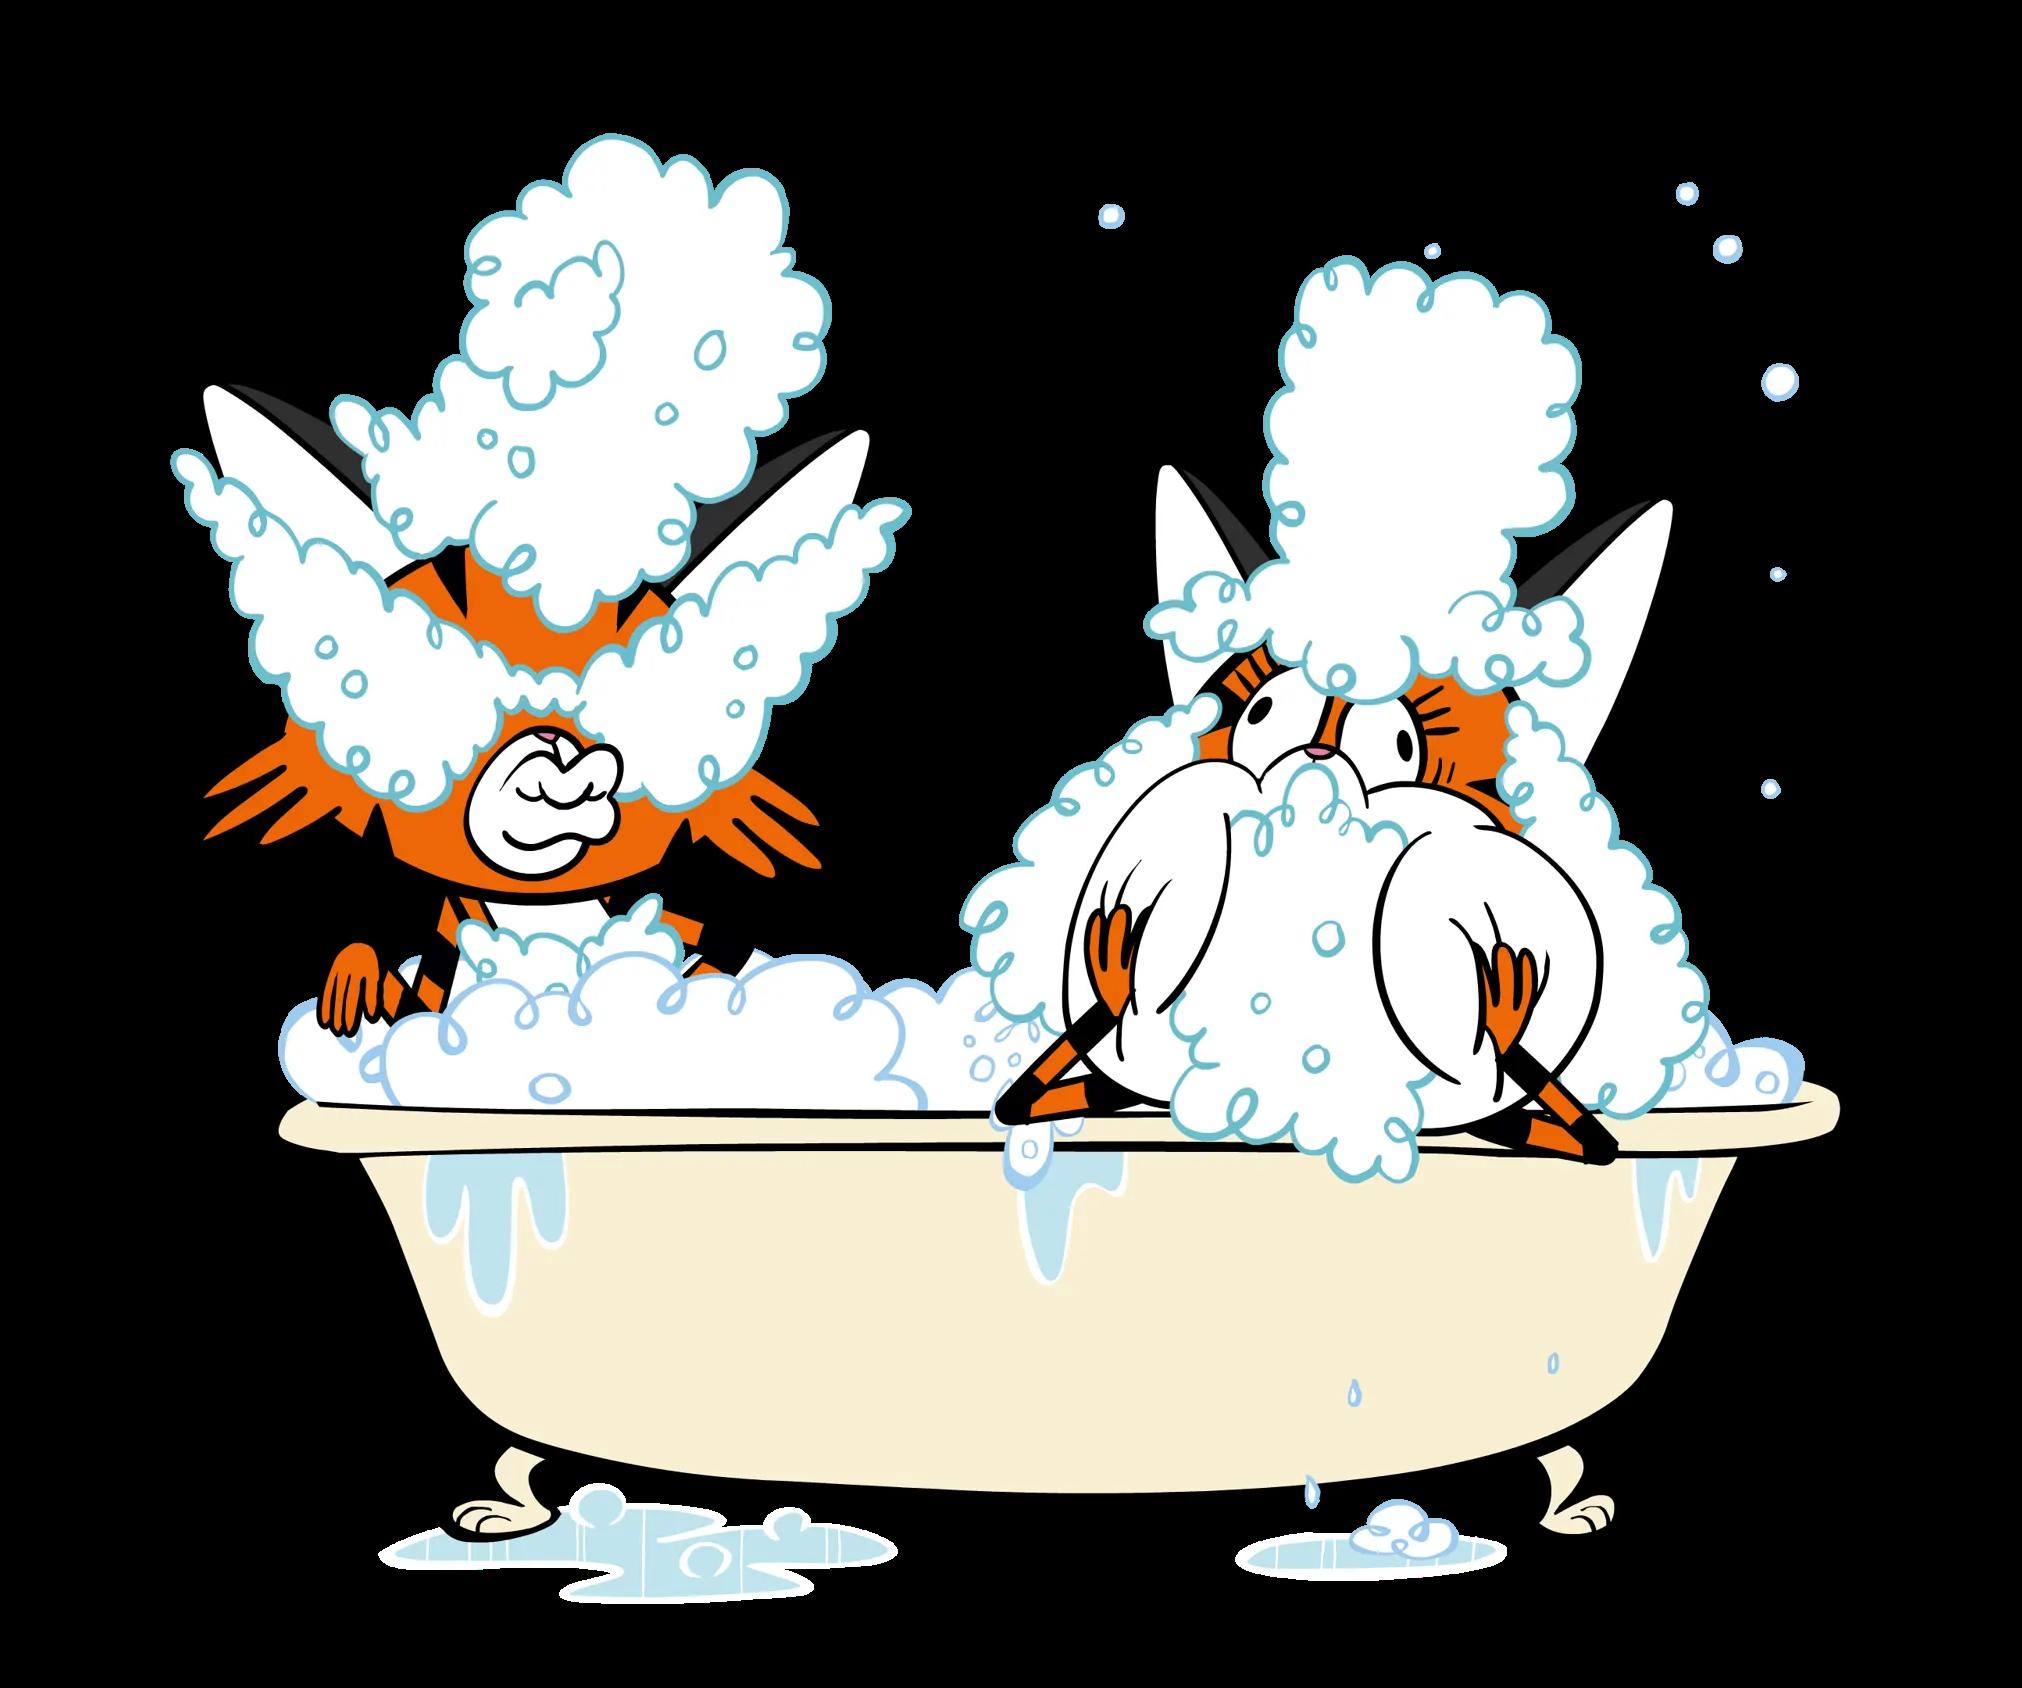 illustrated bubble bath